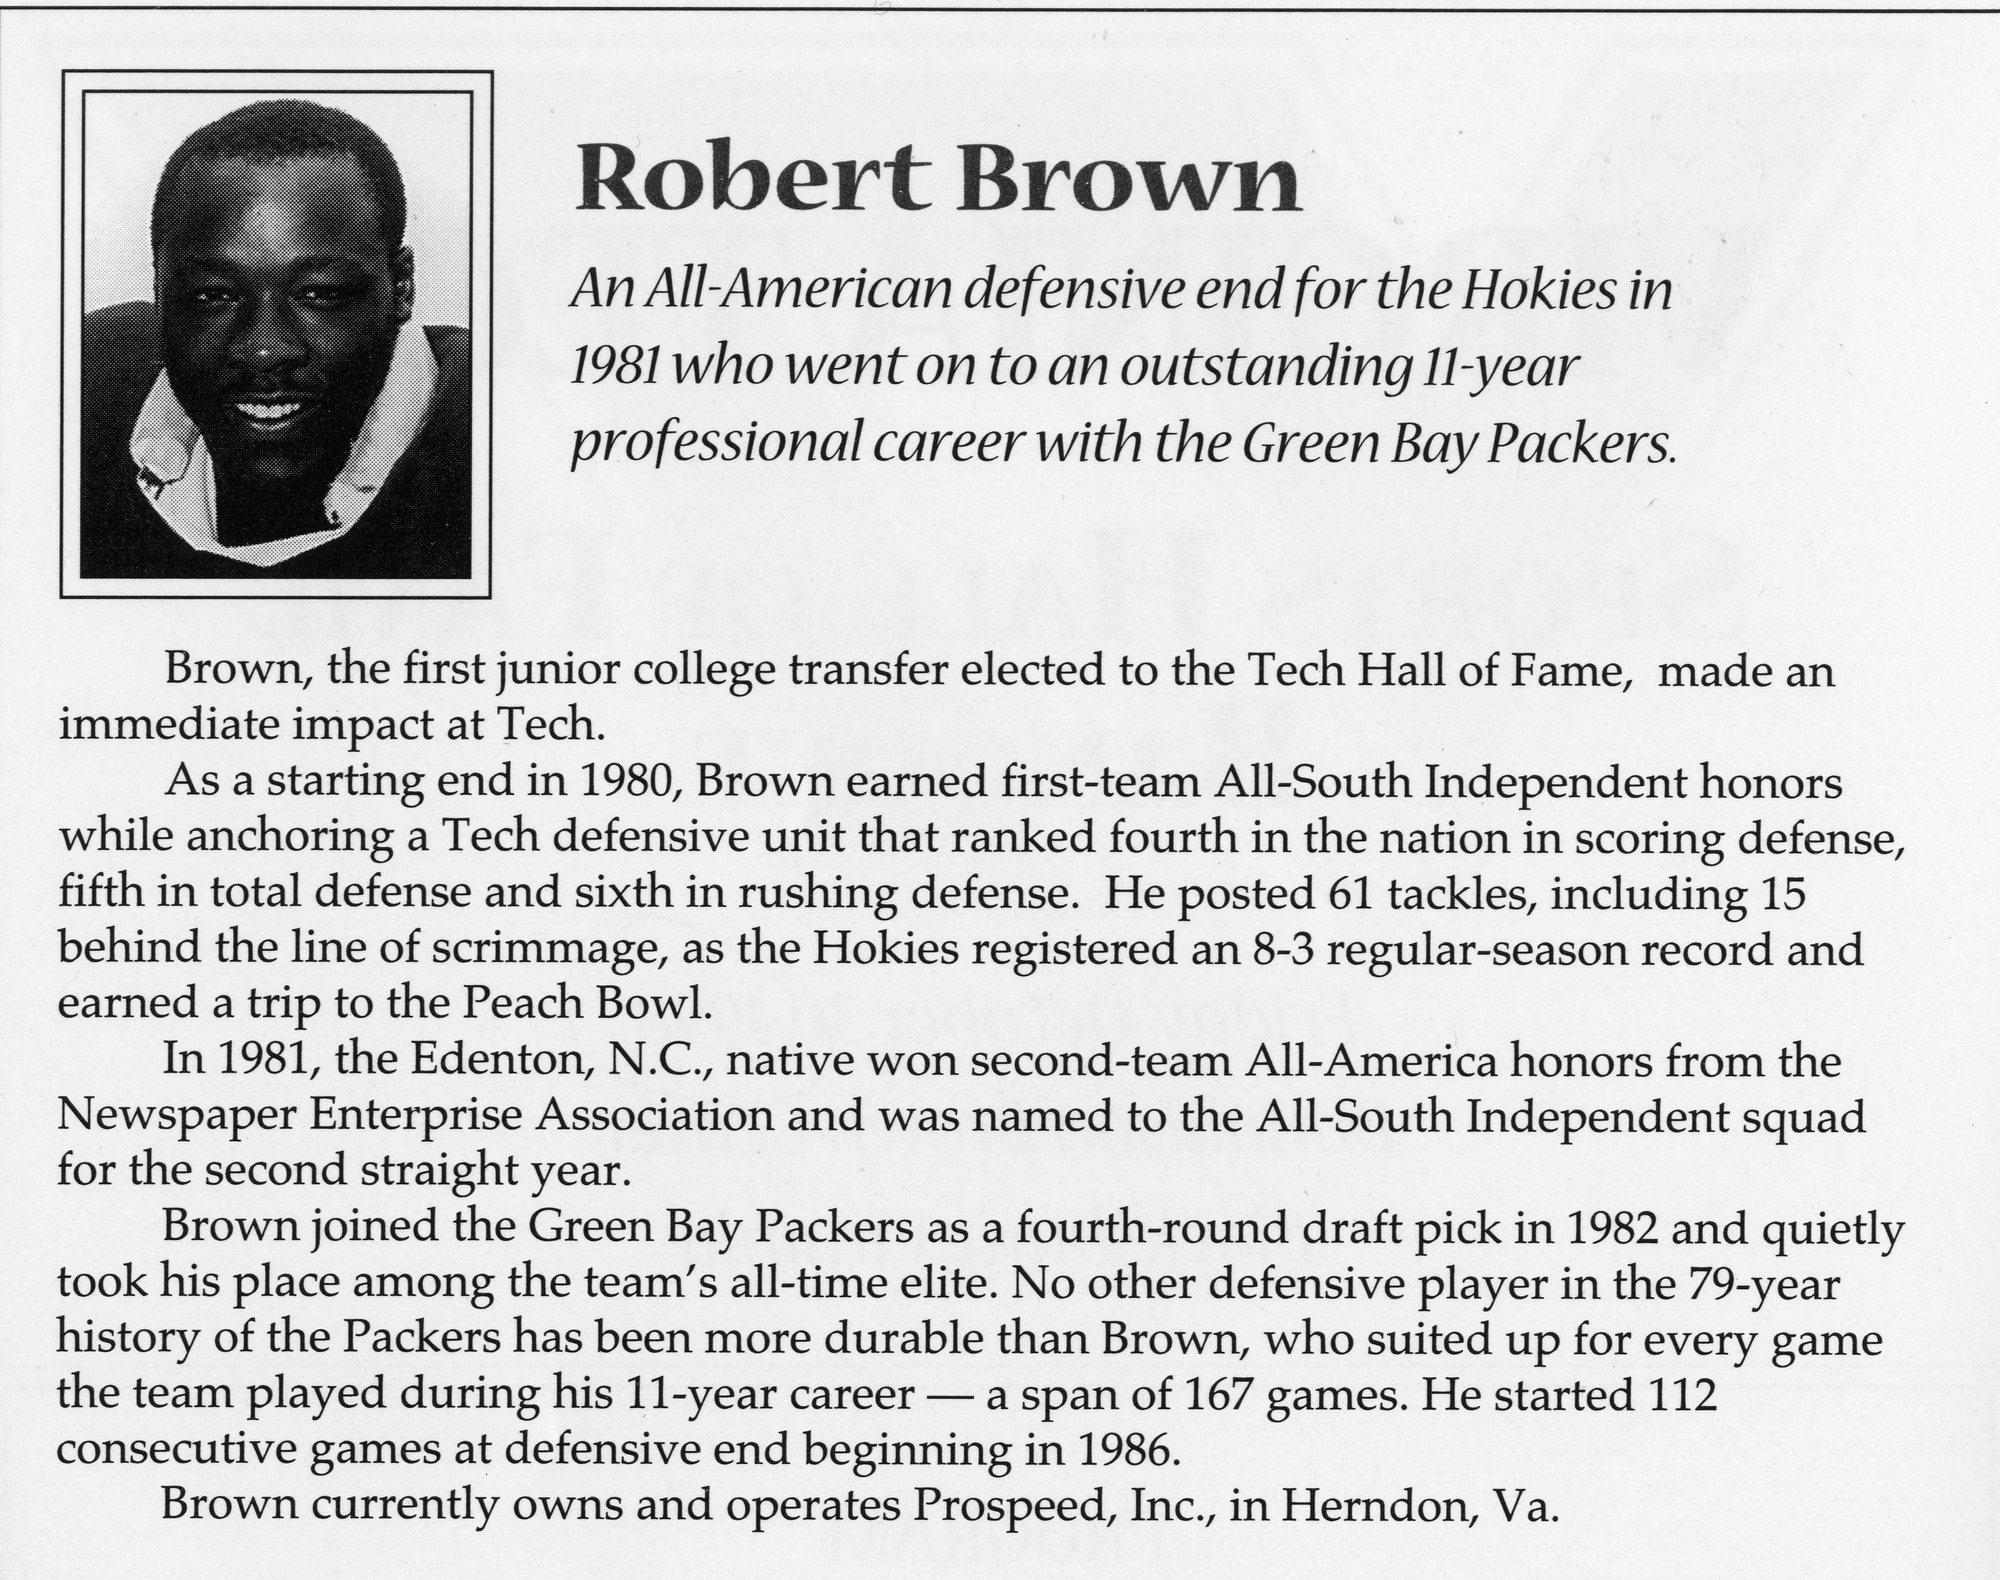 http://spec.lib.vt.edu/pickup/Omeka_upload/BrownRobert_1998.jpg